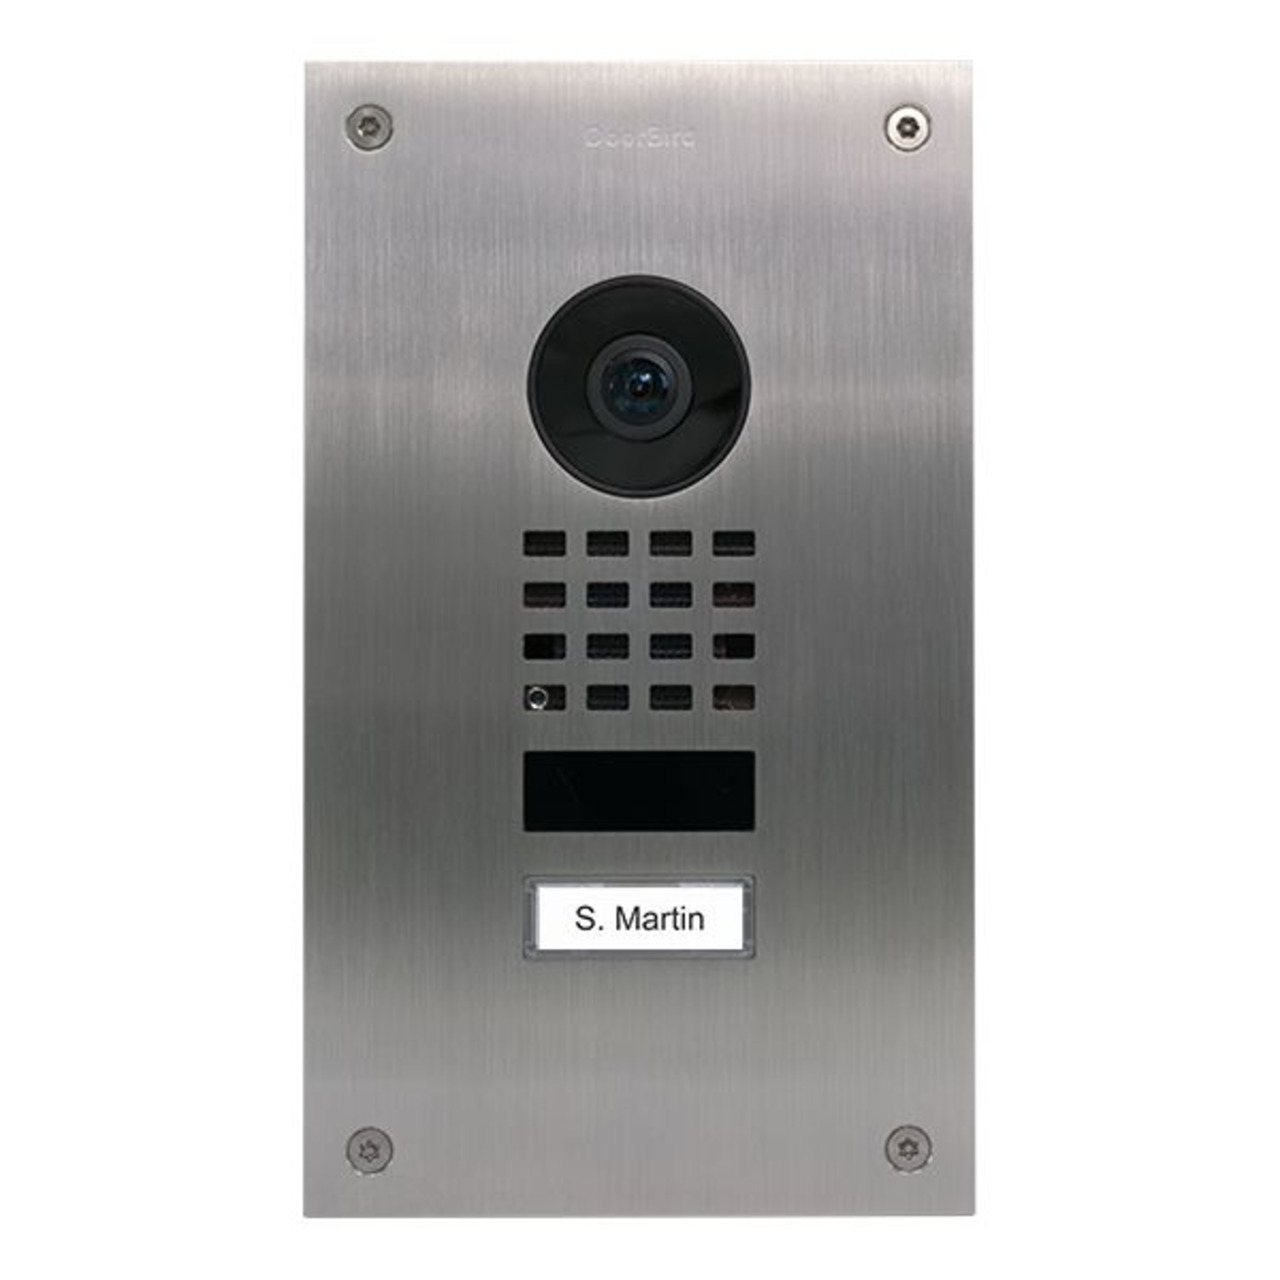 Doorbird WLAN-IP-Türsprechanlage D1101UV- Edelstahl V2A- Unterputz